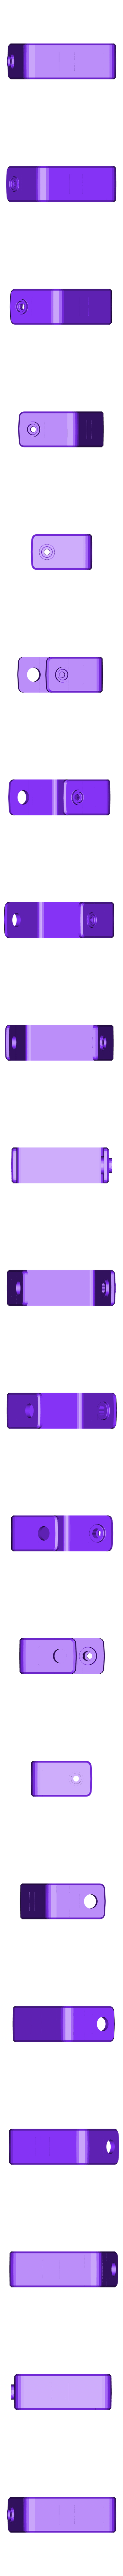 neck bracket.stl Download free STL file GADGET the robotic Gremlin • 3D printing object, atarka3